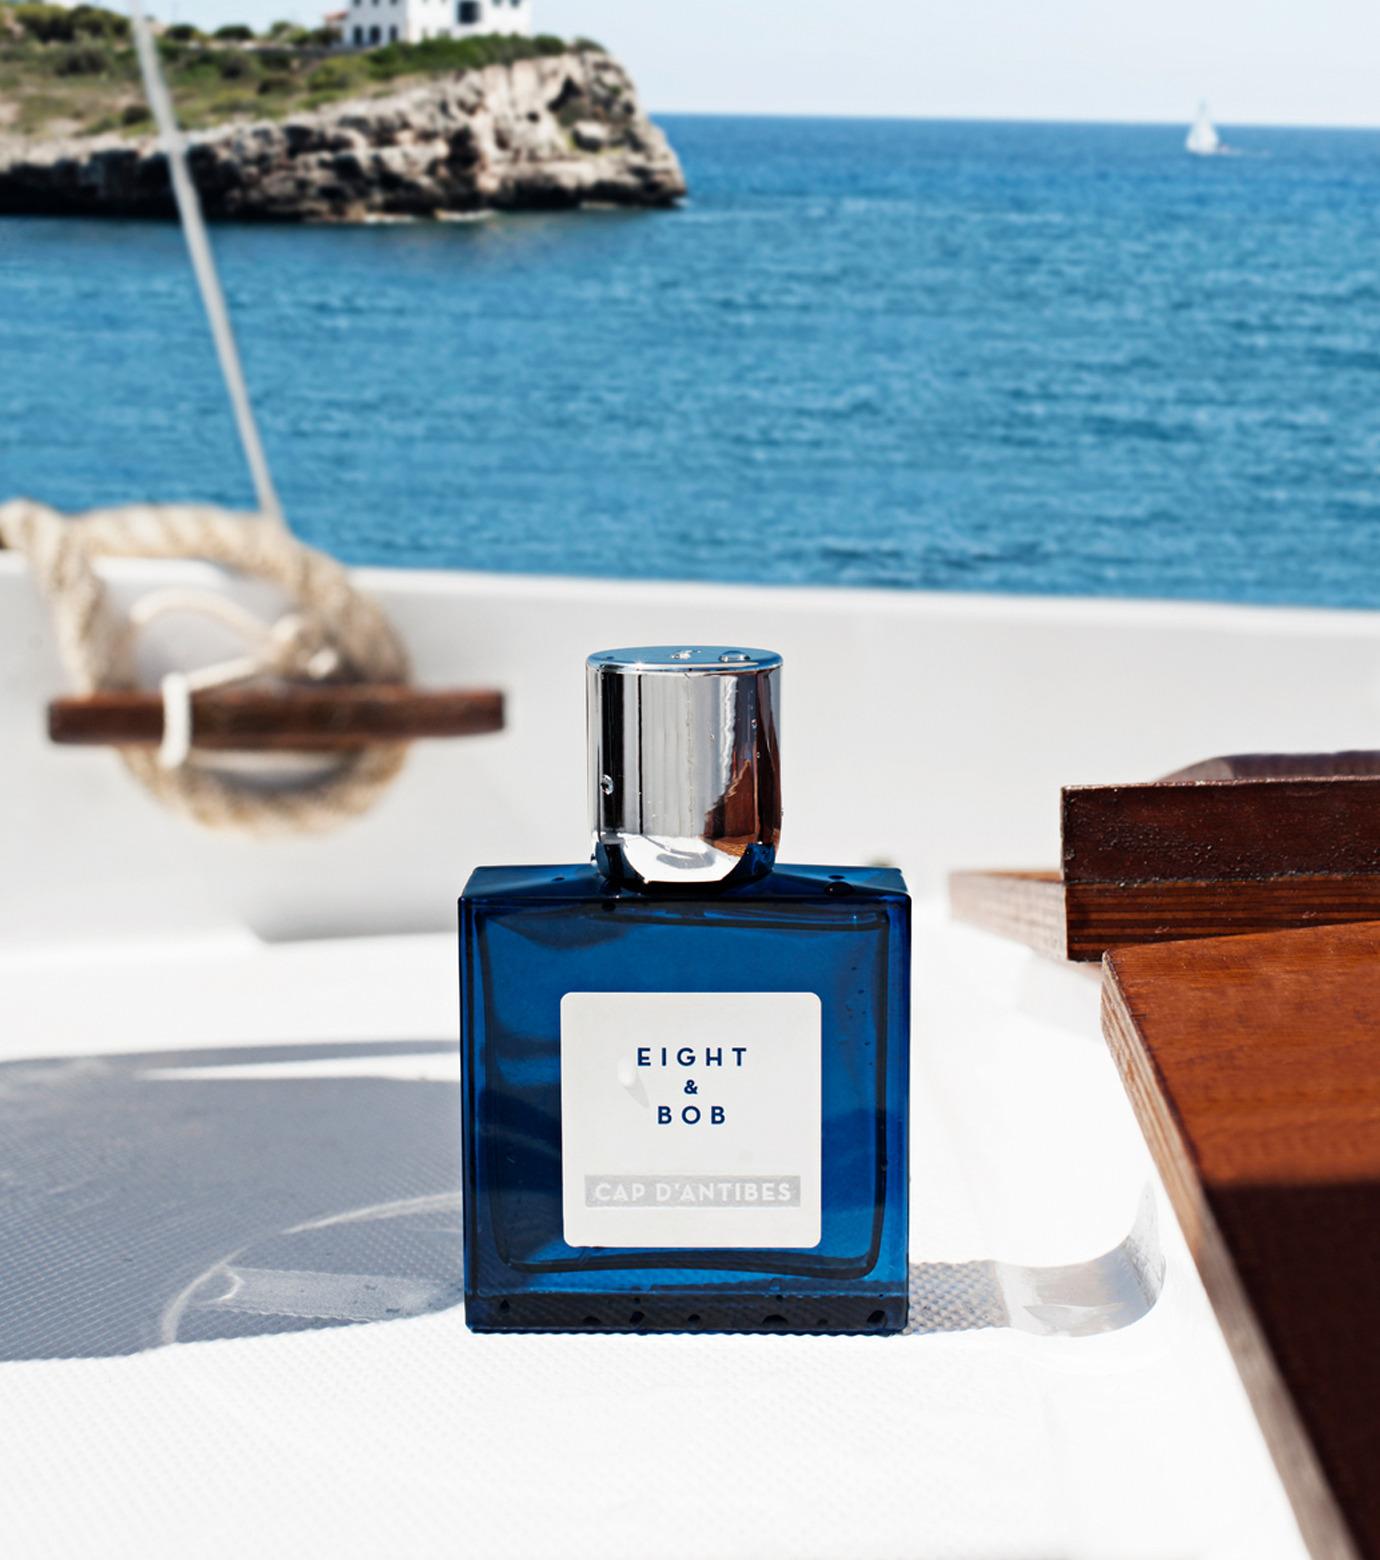 EIGHT&BOB(エイト&ボブ)のCAP D'ANTIBES eau de parfum-NAVY(フレグランス/fragrance)-101FR-CD1024-93 拡大詳細画像3